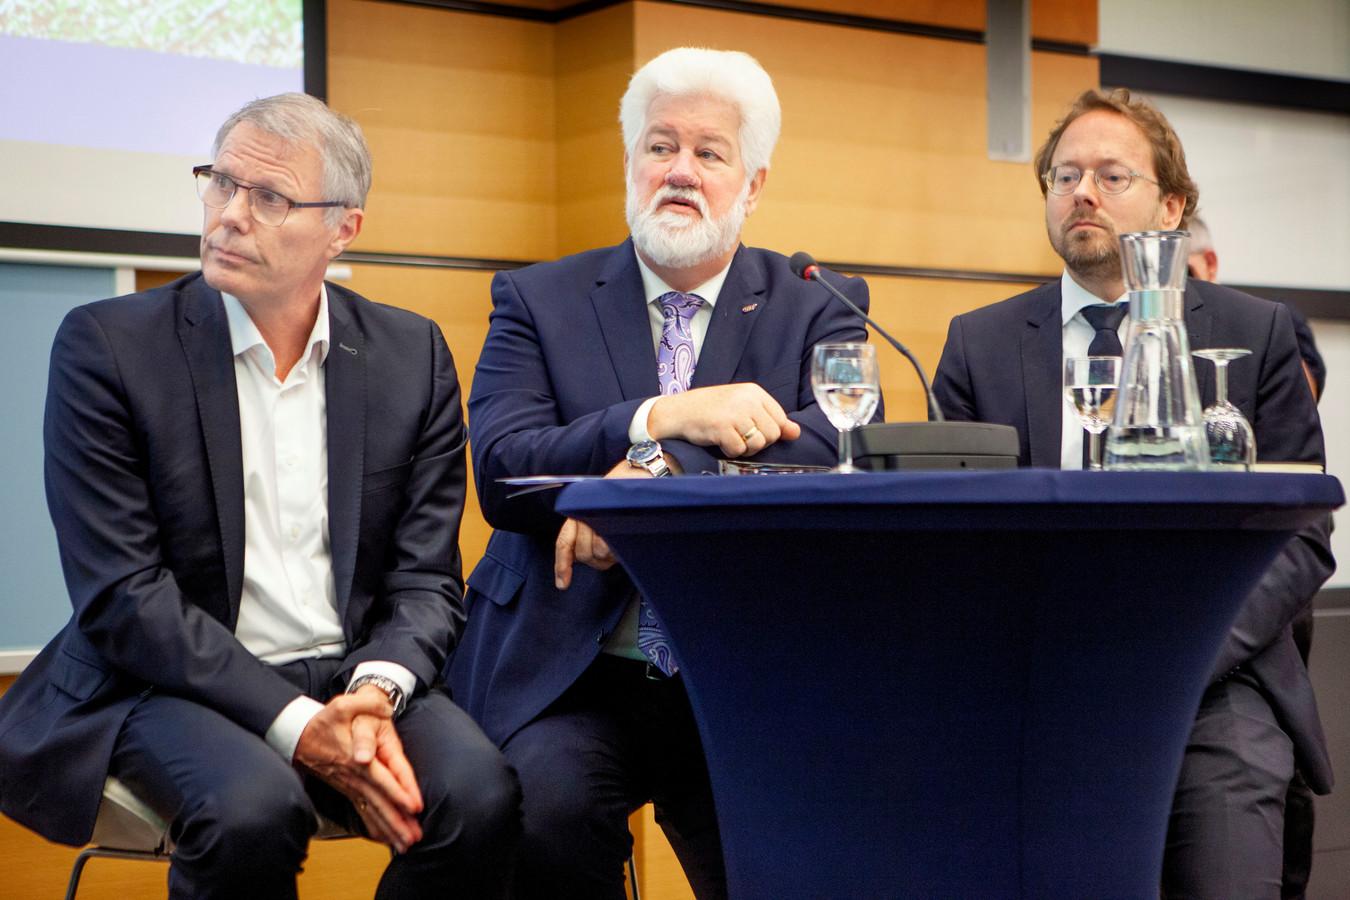 Sociale partners en Minister presenteren Pensioen akkoord. Vlnr Han Busker FNV, van Wijngaarden CNV